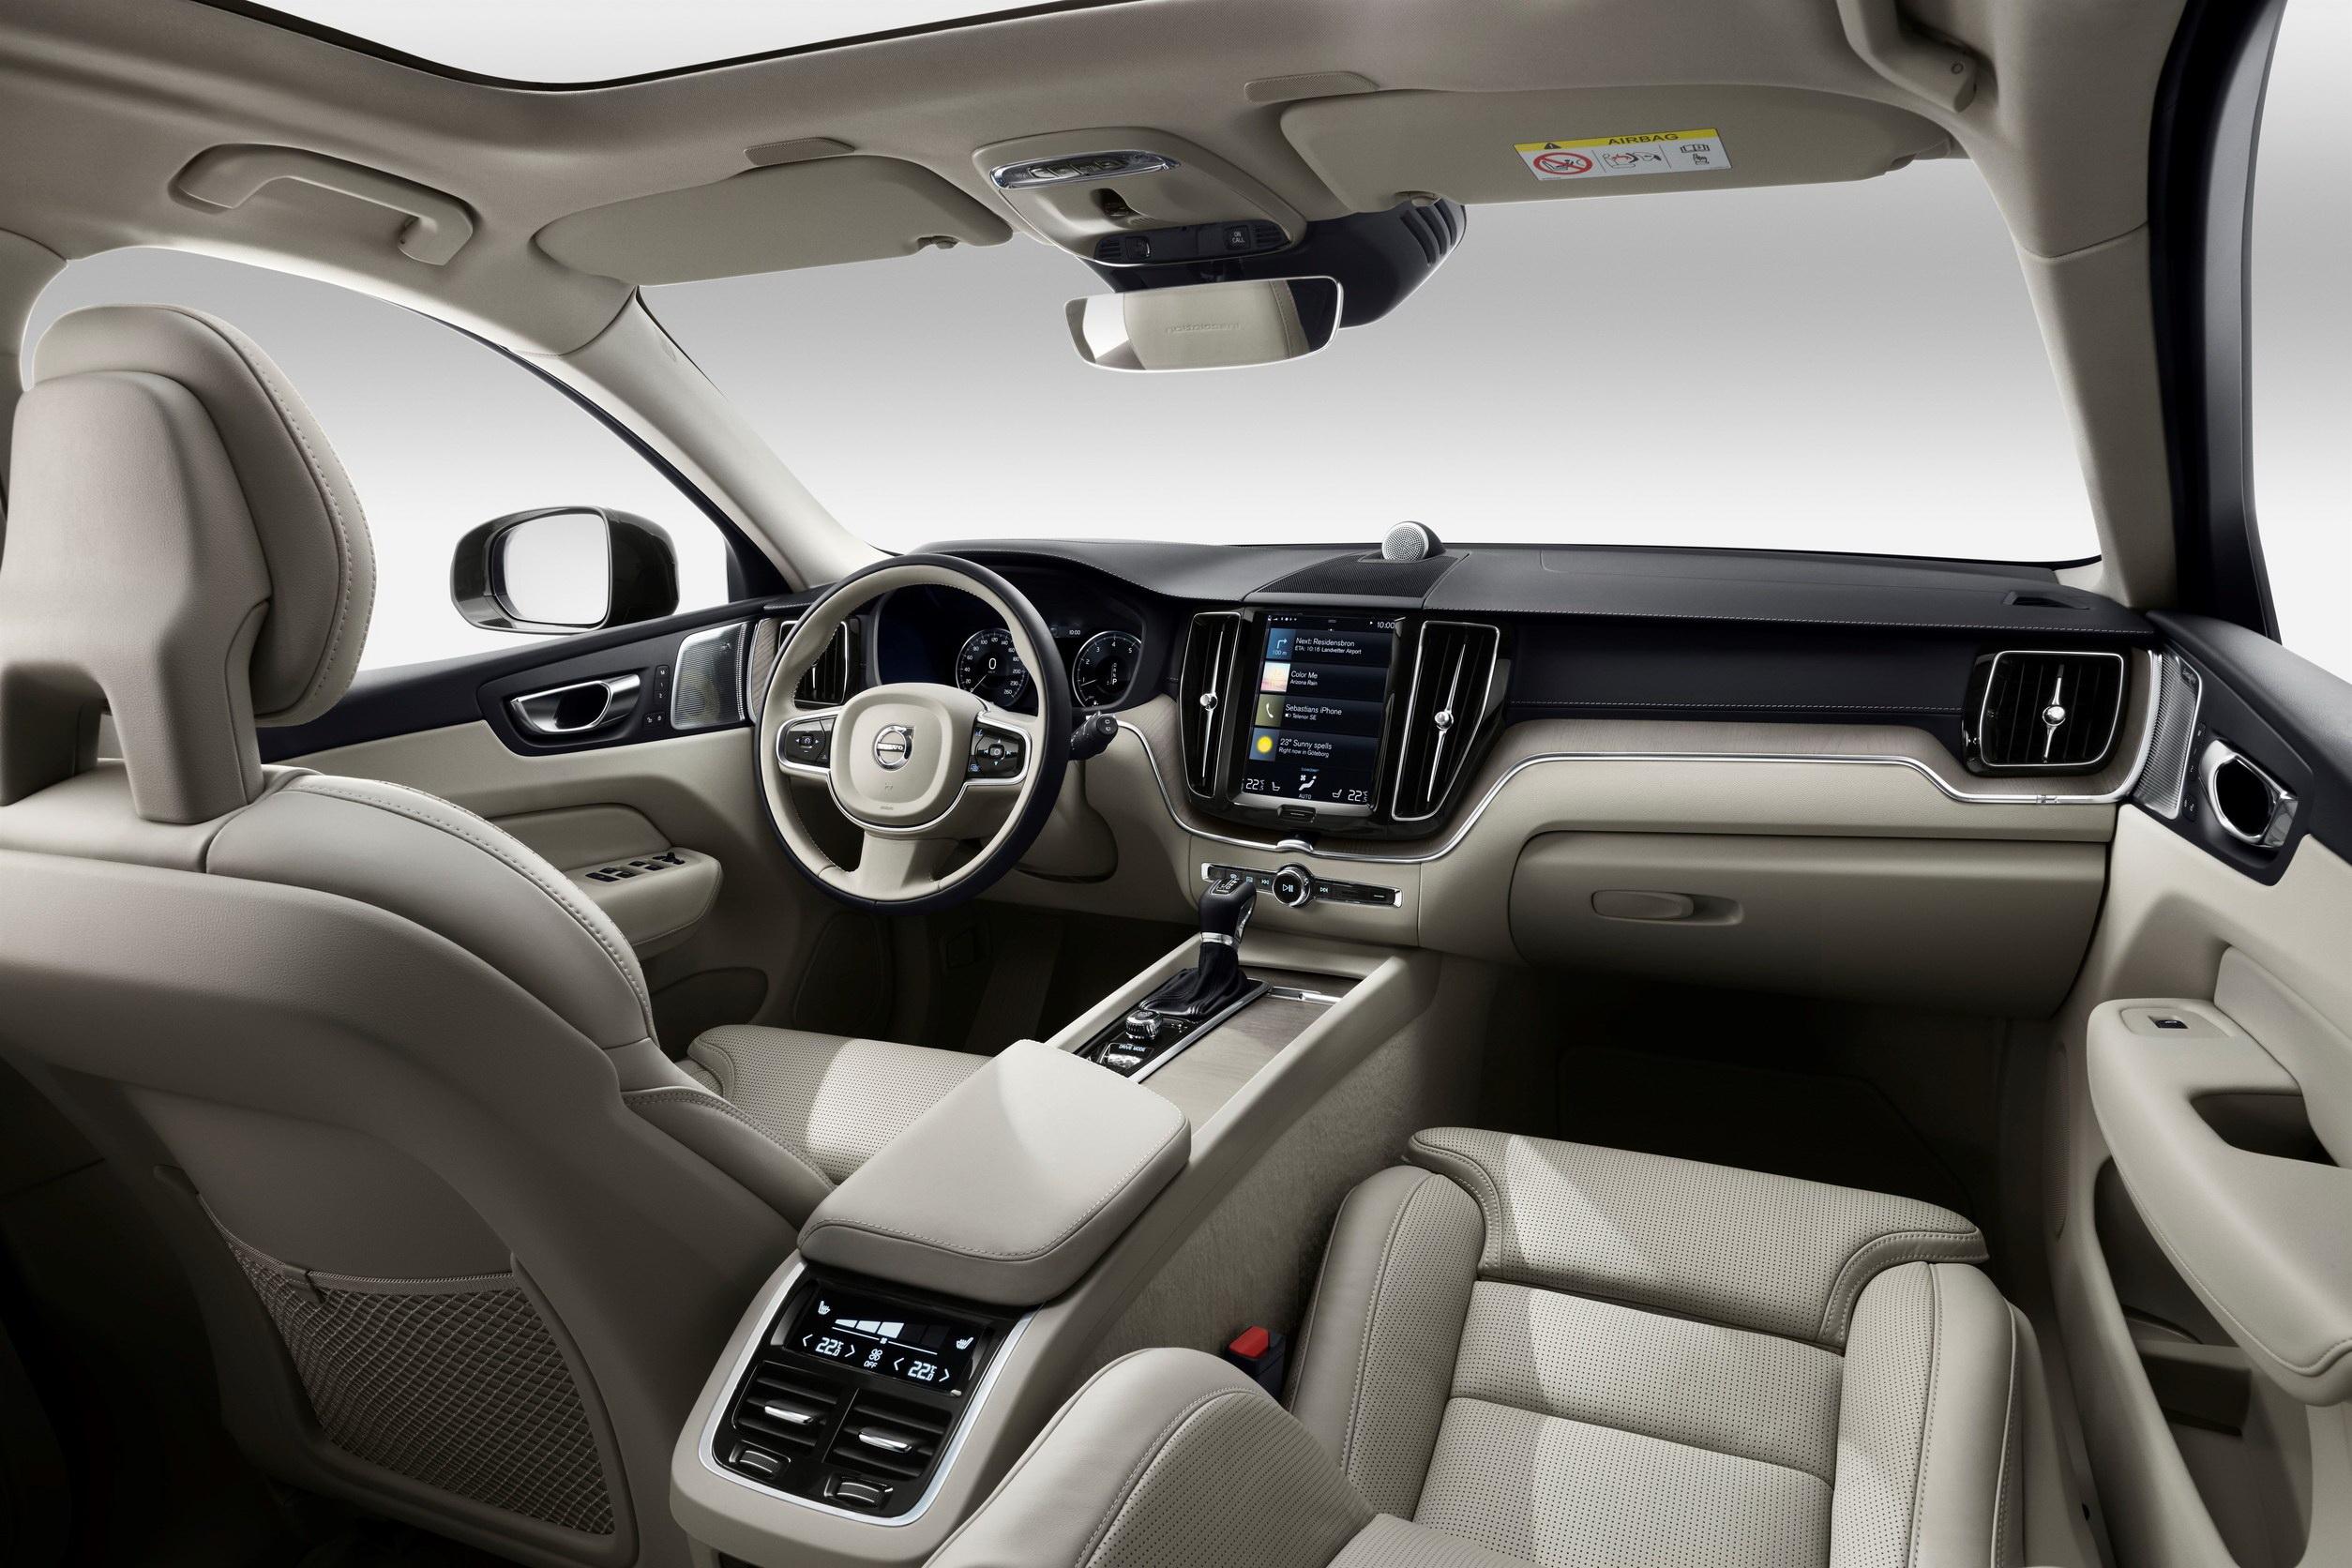 The new Volvo XC60 - Das Infoportal